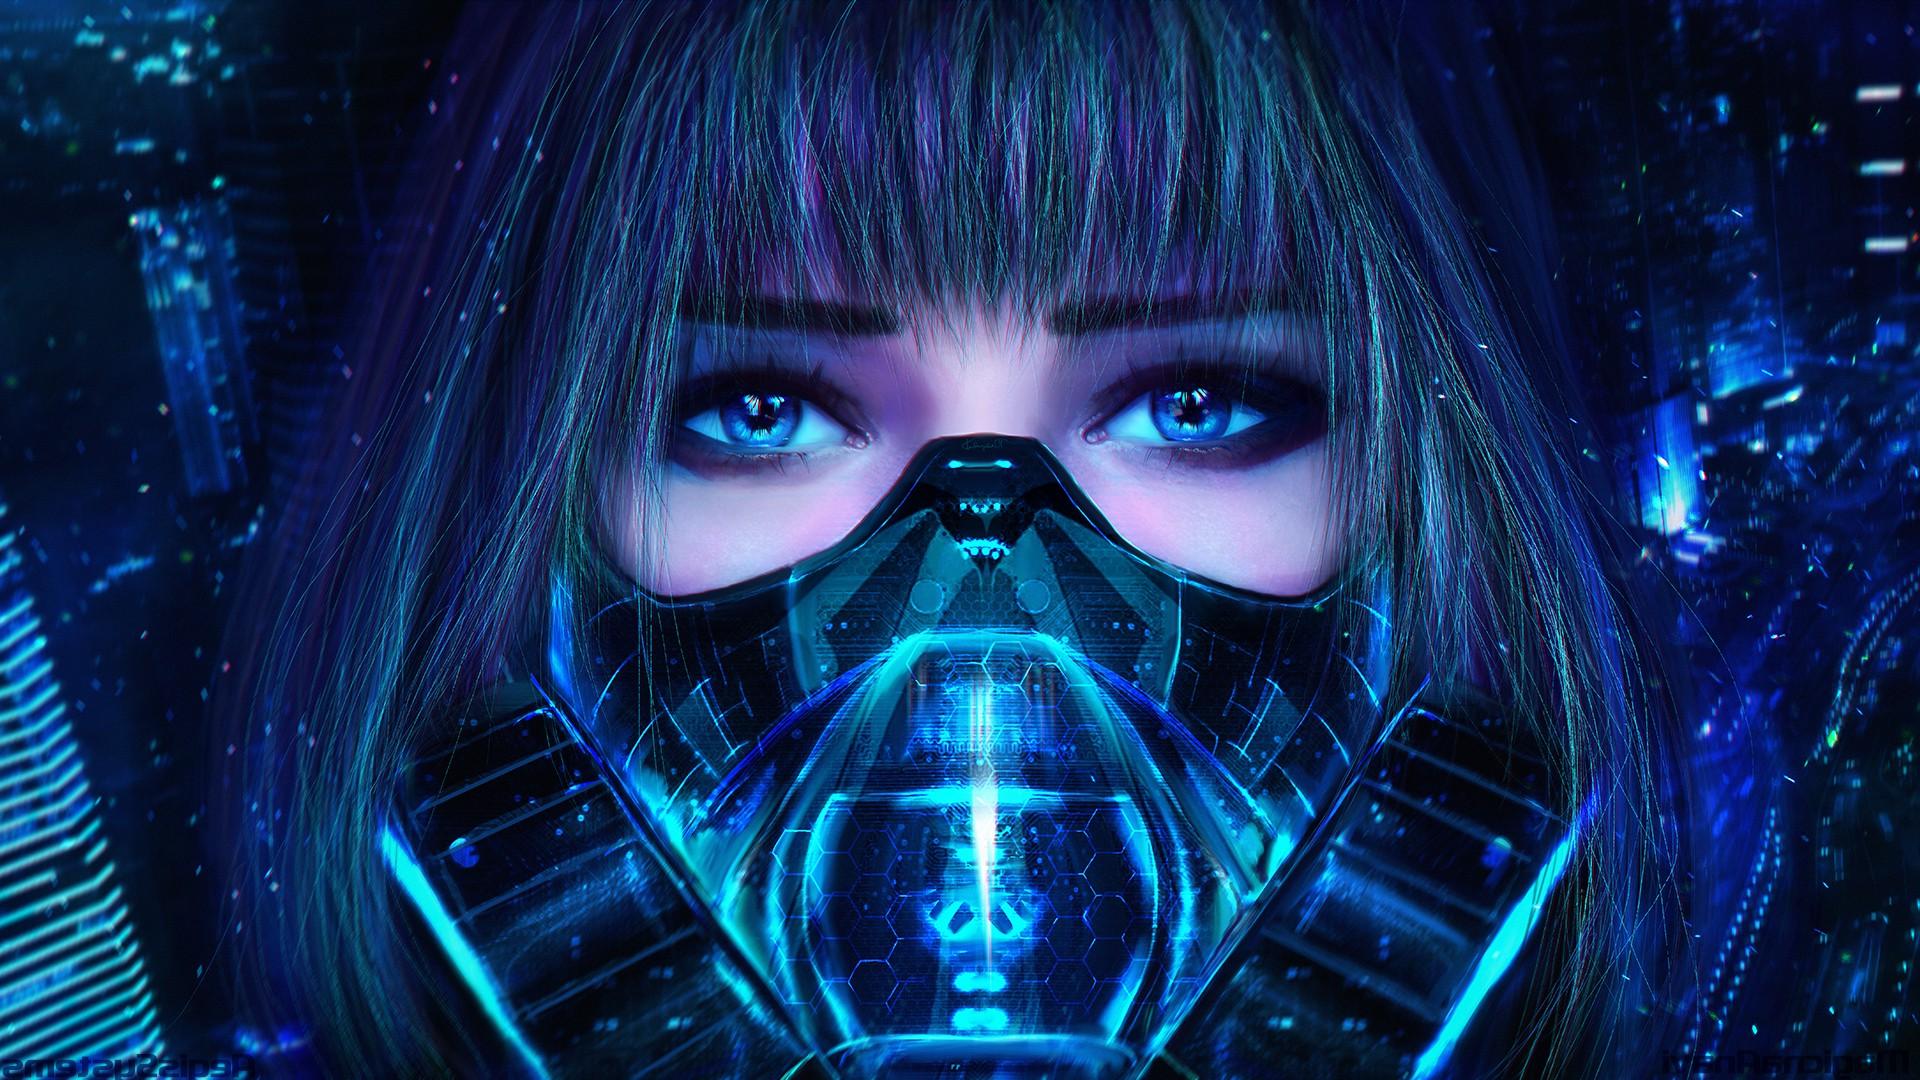 Wallpaper 1920x1080 Px Anime Girls Bangs Black Lagoon Blue Eyes Blue Hair Gas Masks Magicnaanavi Megpoid Gumi Realistic Render 1920x1080 Wallup 1107830 Hd Wallpapers Wallhere